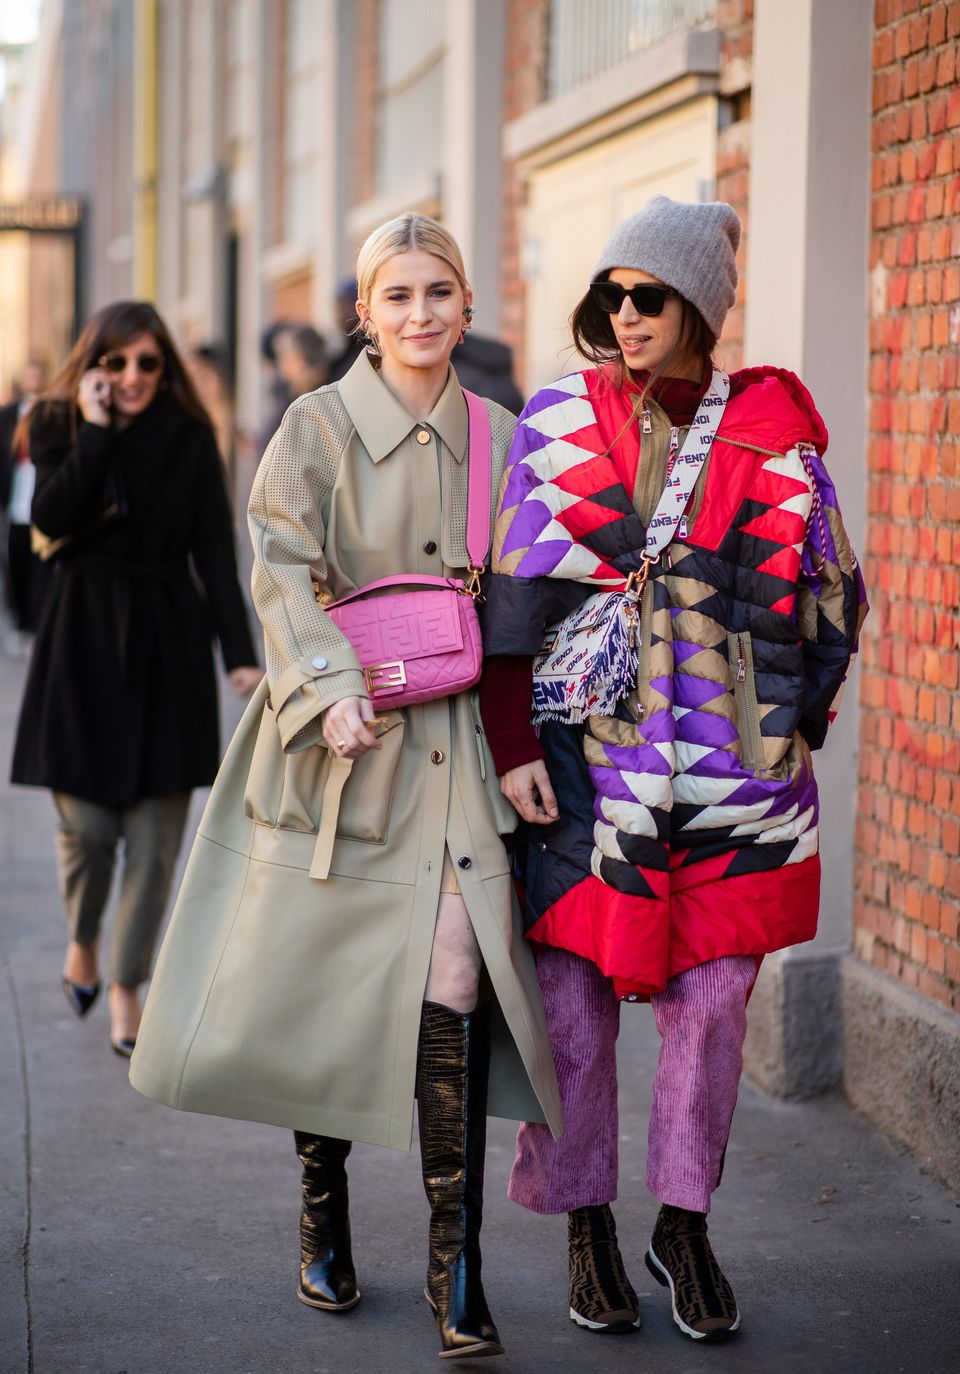 091b0dc1 31 Italian Street Style Photos To Inspire Your Wardrobe   HuffPost Life